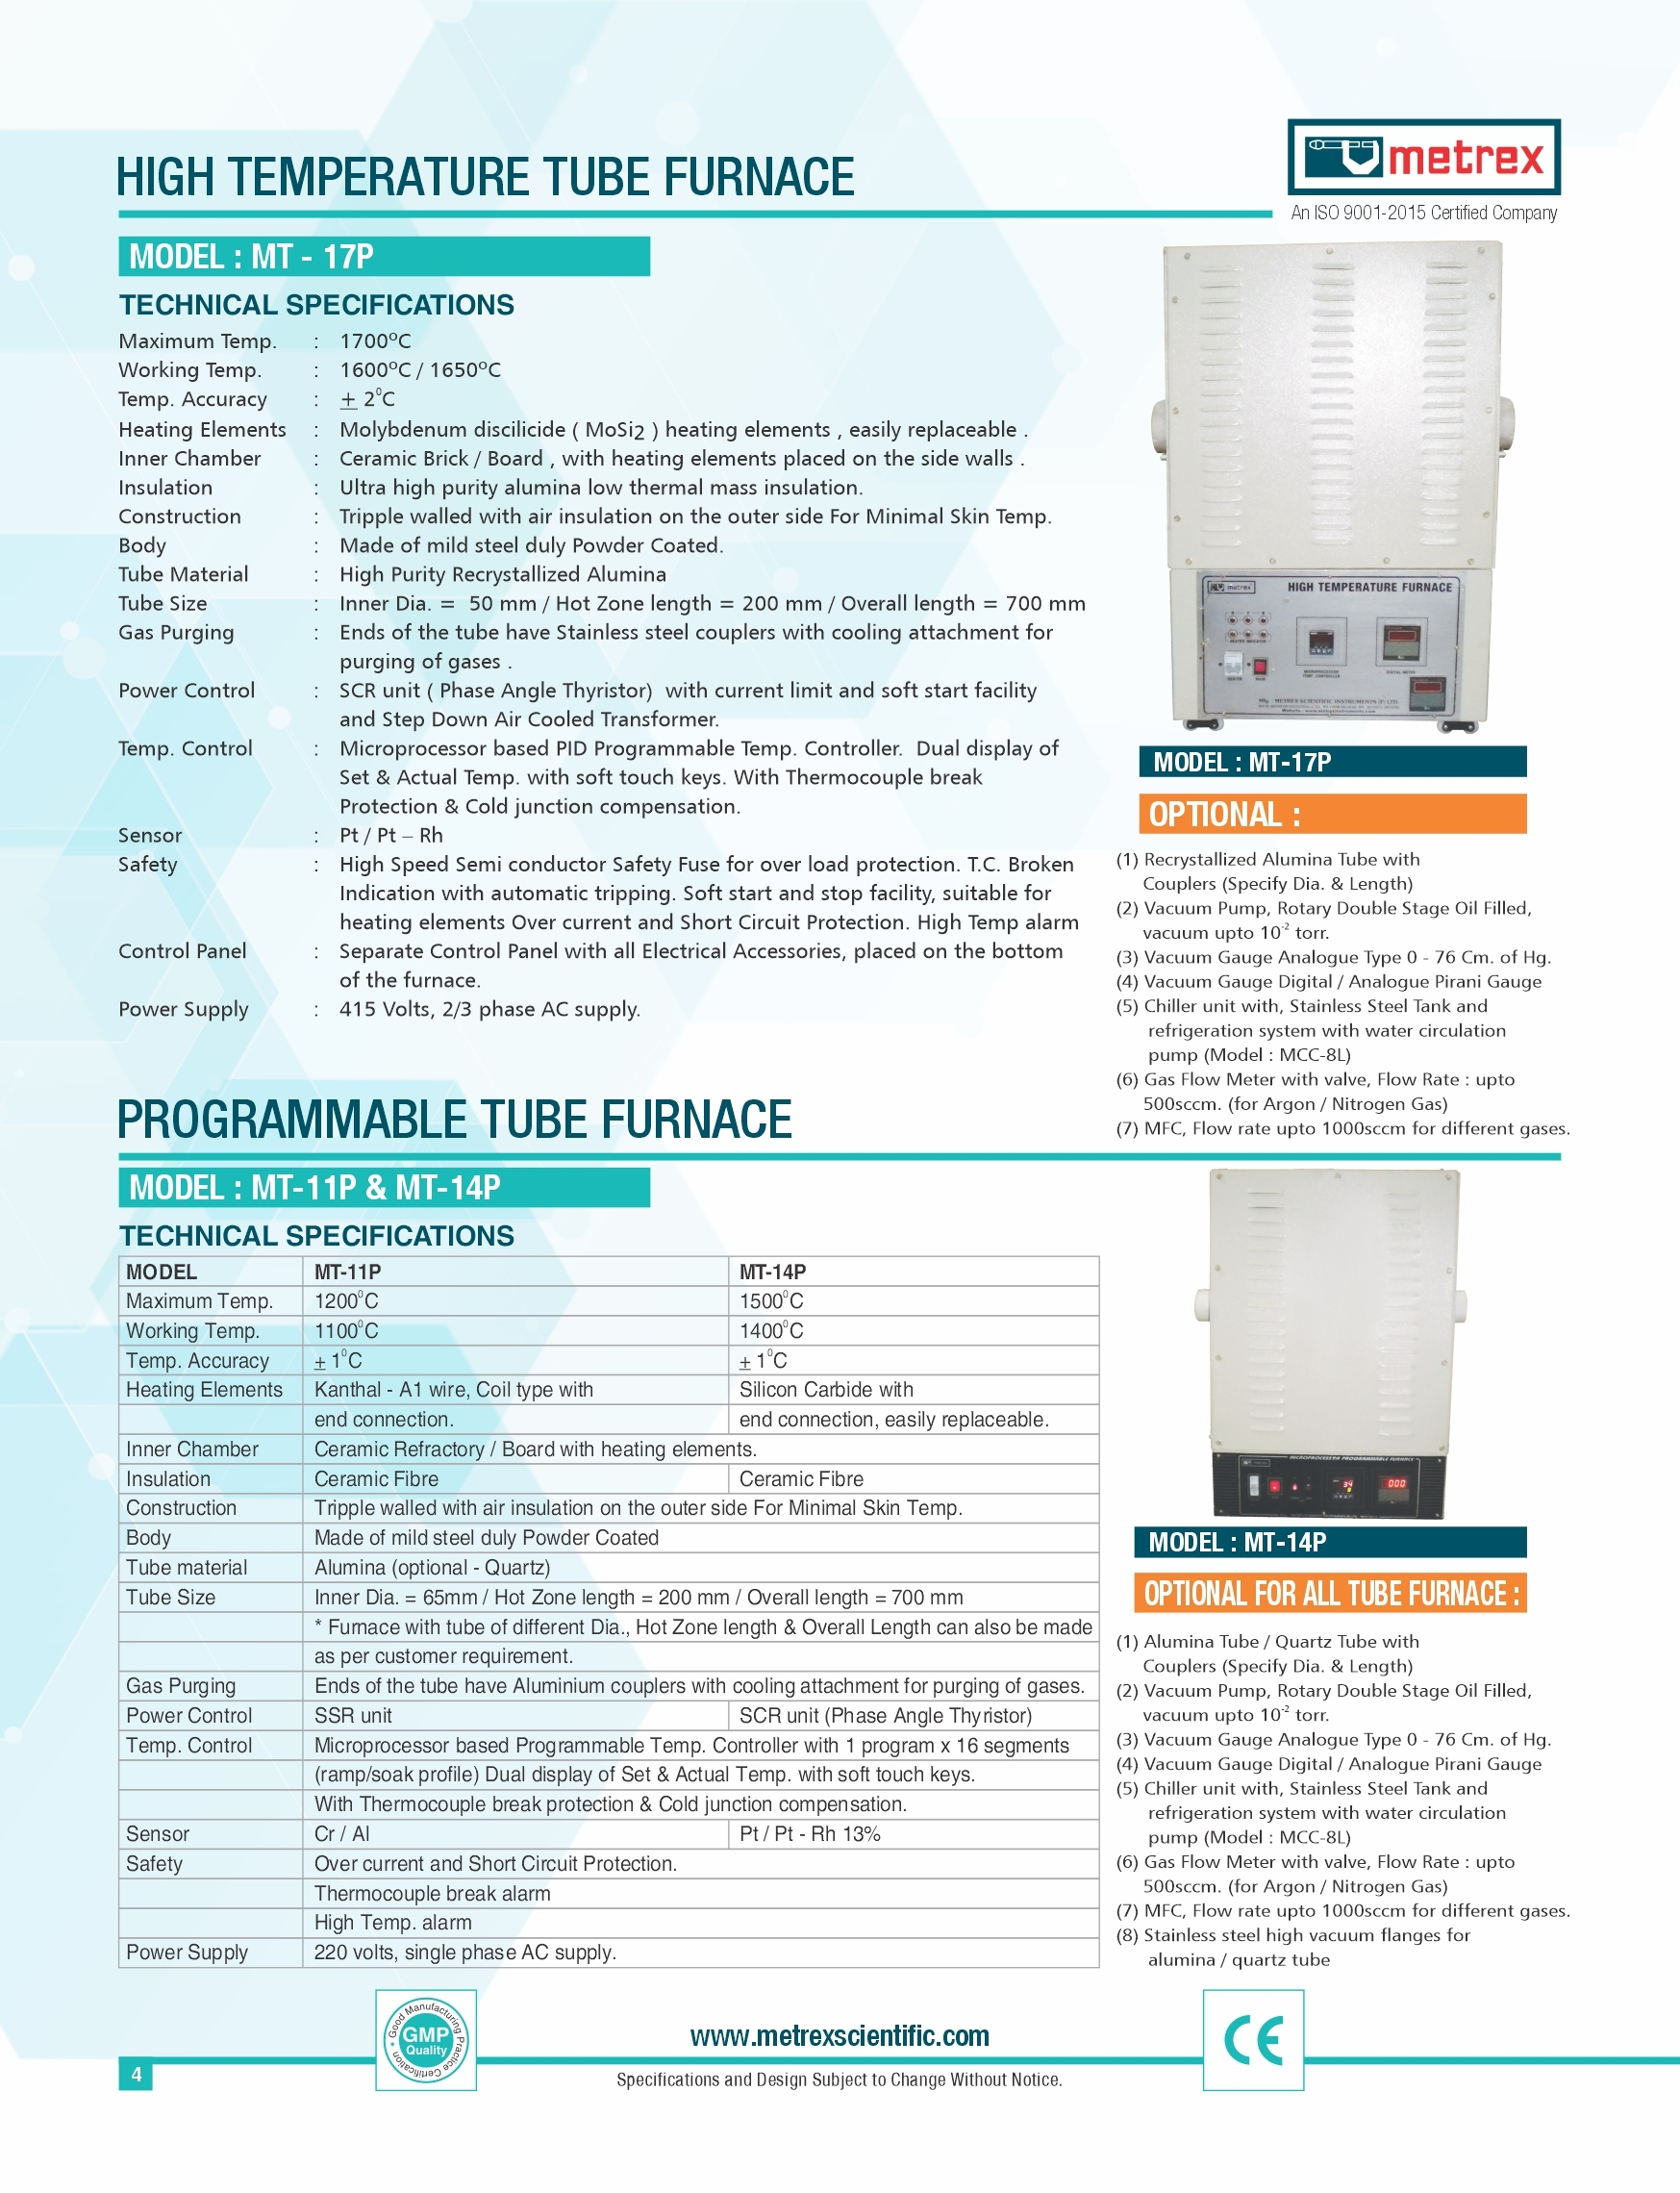 Programmable Tube Furnace